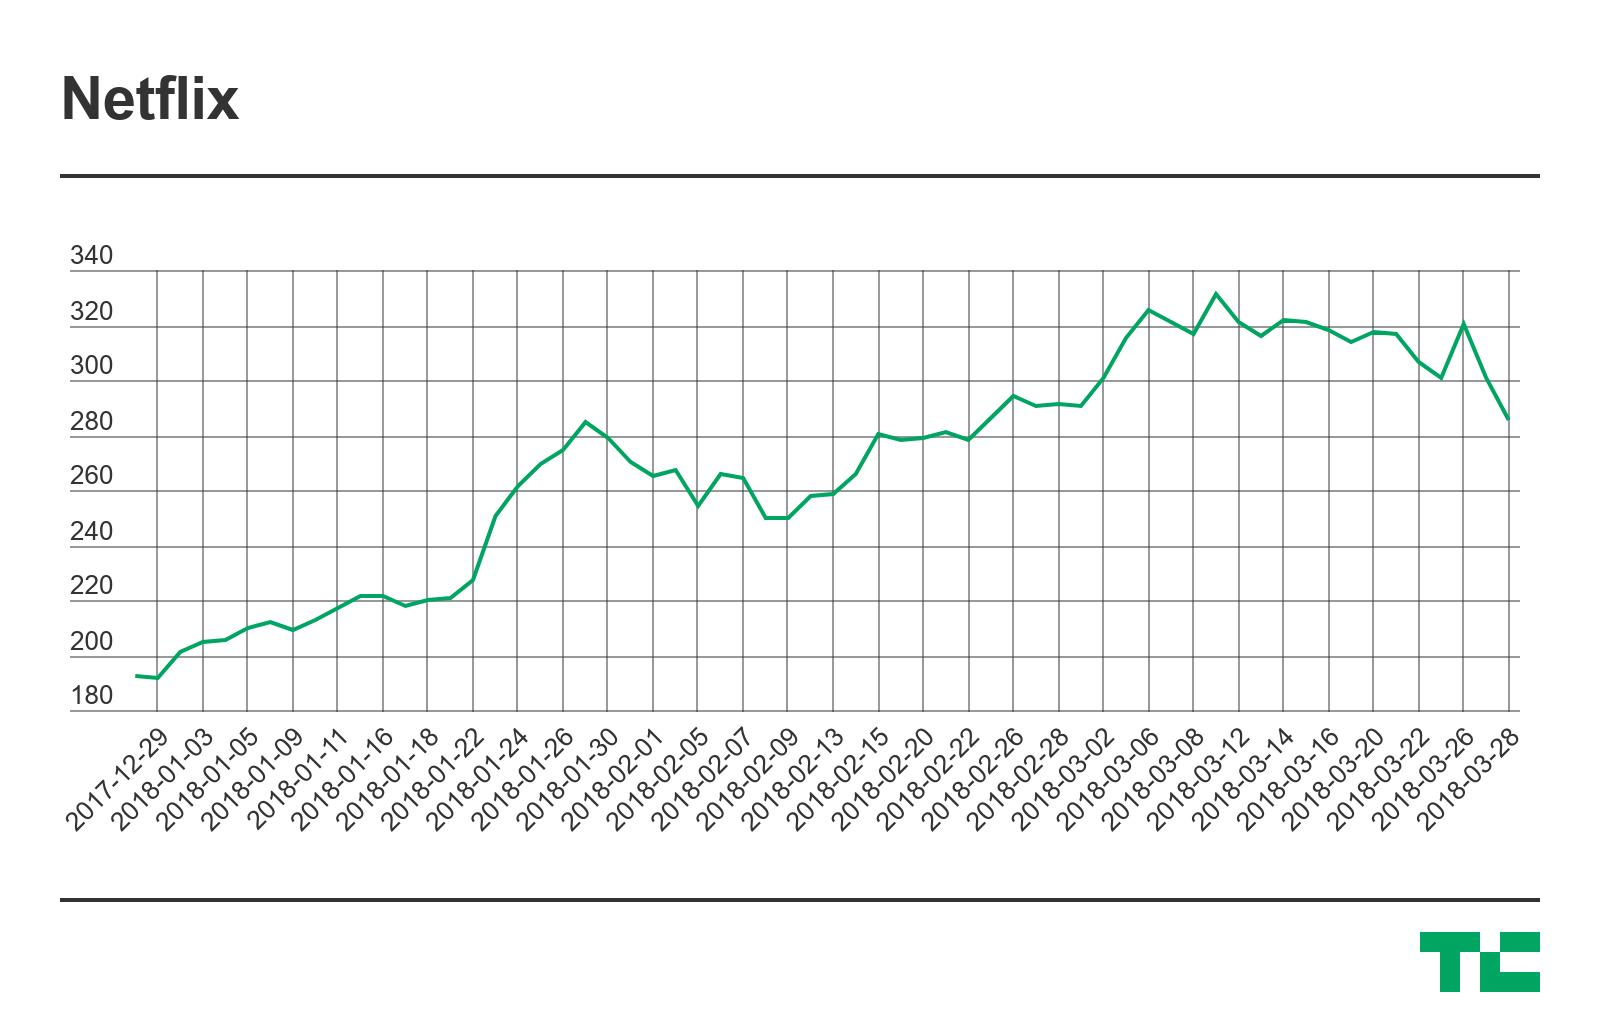 netflix stock chart march 2018